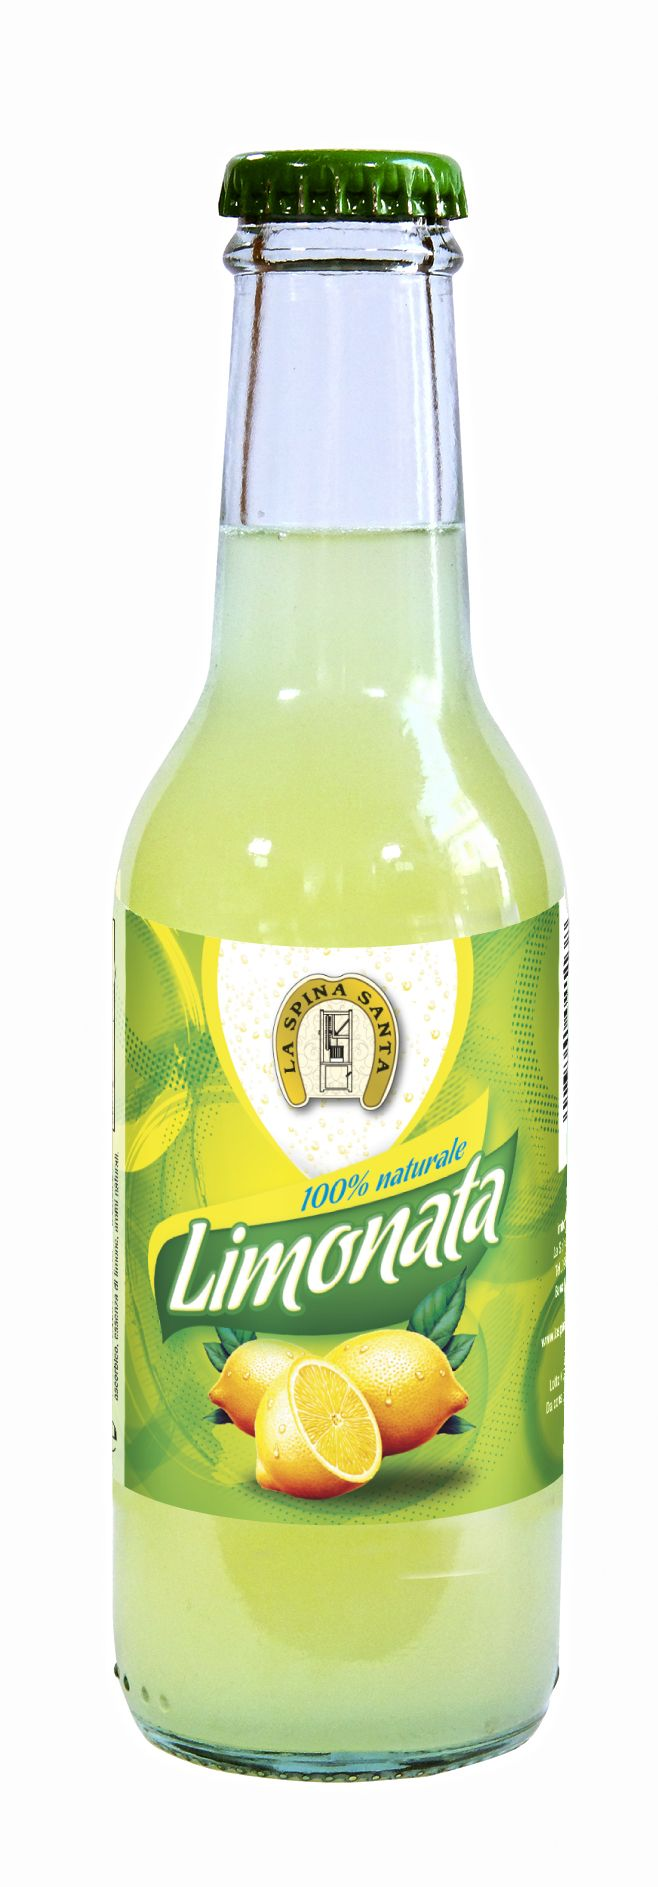 Etichetta Bibita / Limonata La Spina Santa Soft Drink Label / La Spina Santa Lemonade